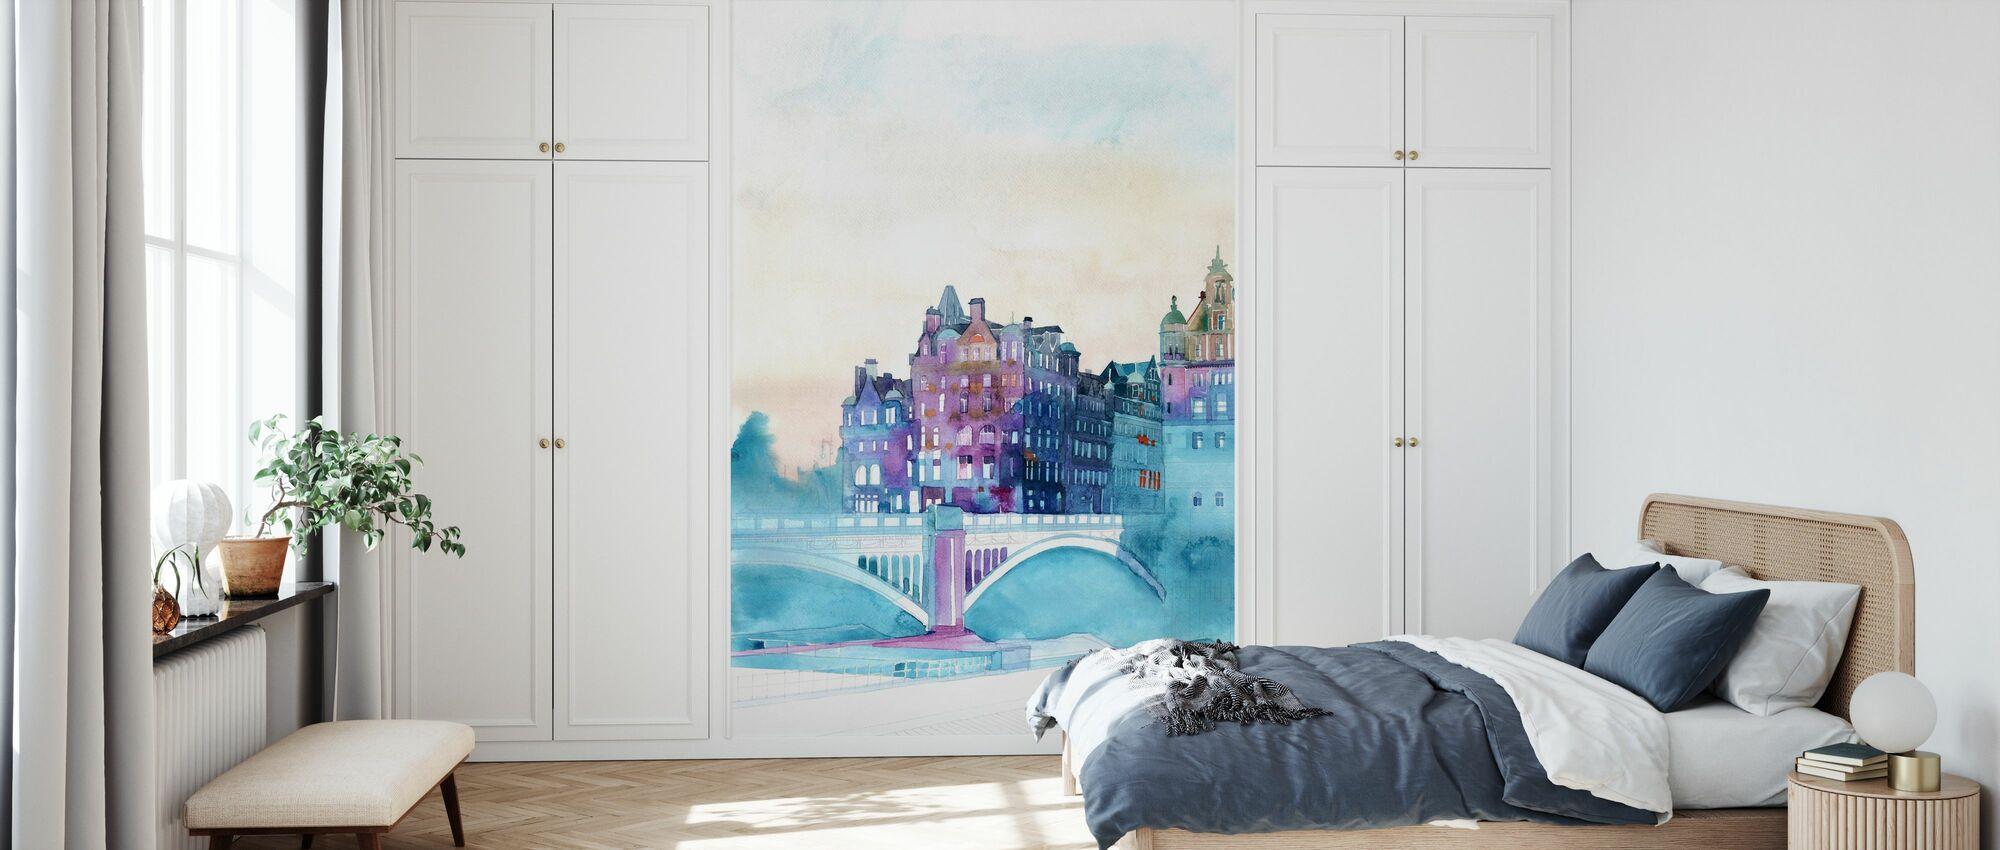 Winter in Edinburgh - Wallpaper - Bedroom